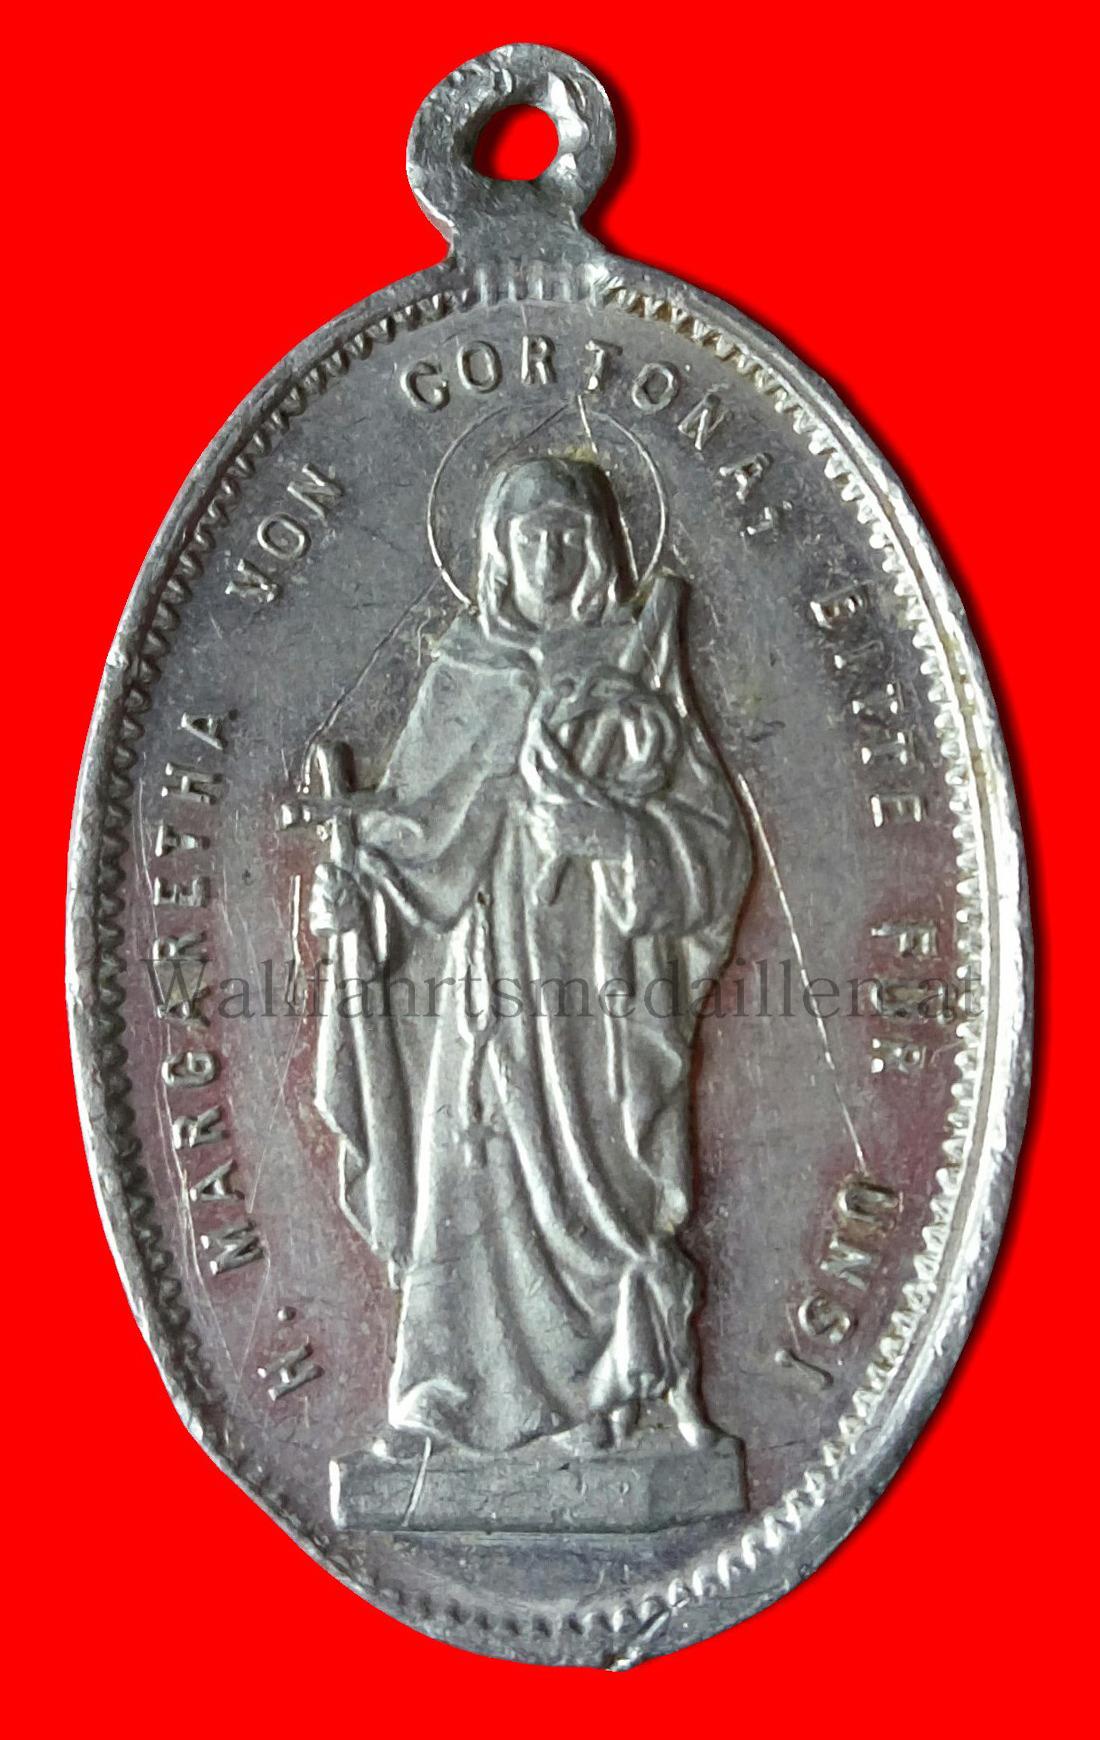 Margareta von Cortona